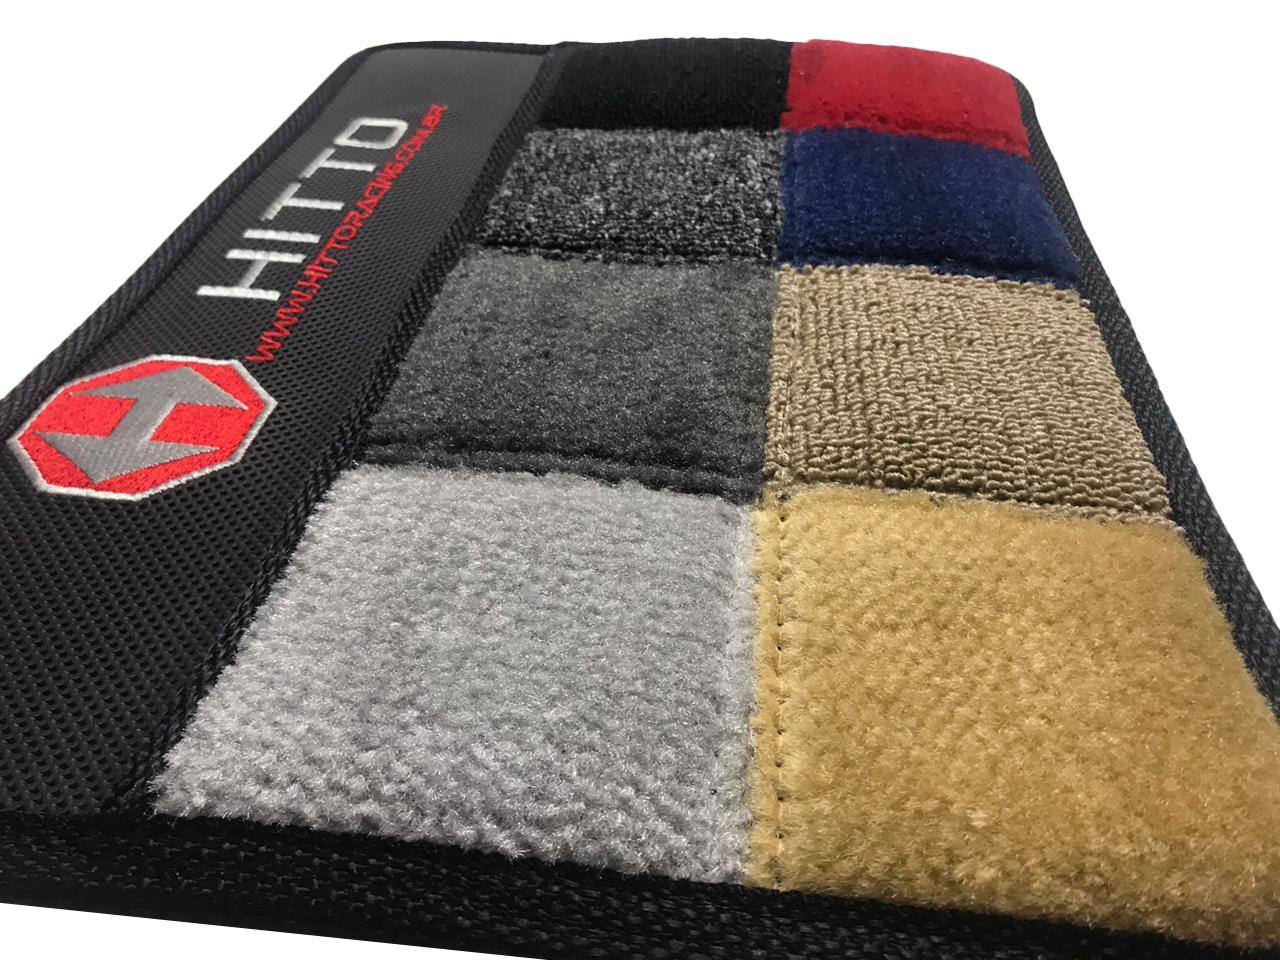 Tapete Bmw M5 Carpete Premium Alto Padrão Hitto